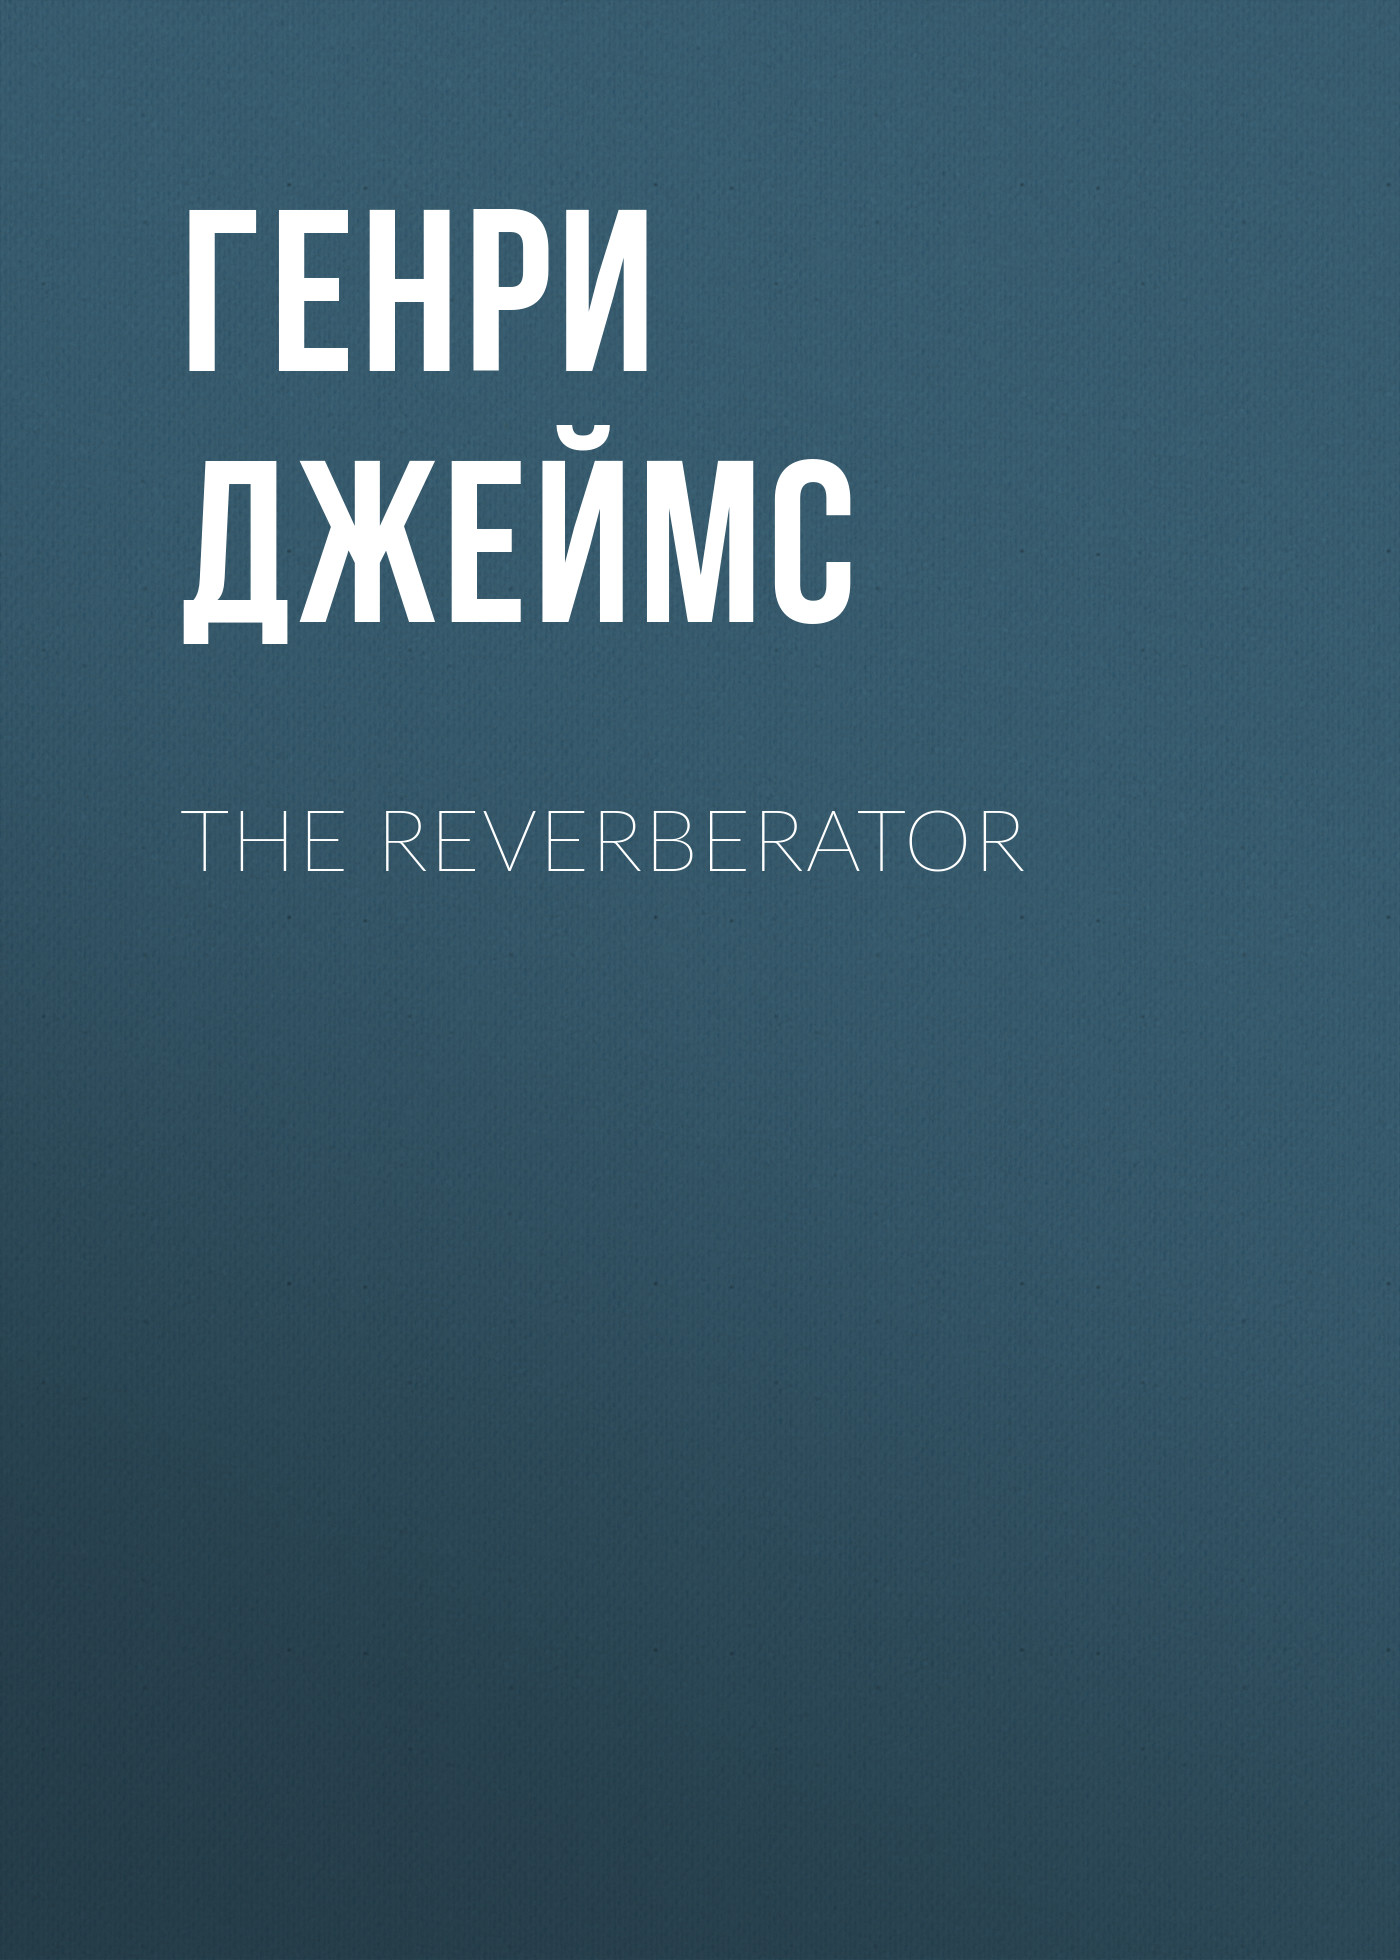 Генри Джеймс The Reverberator